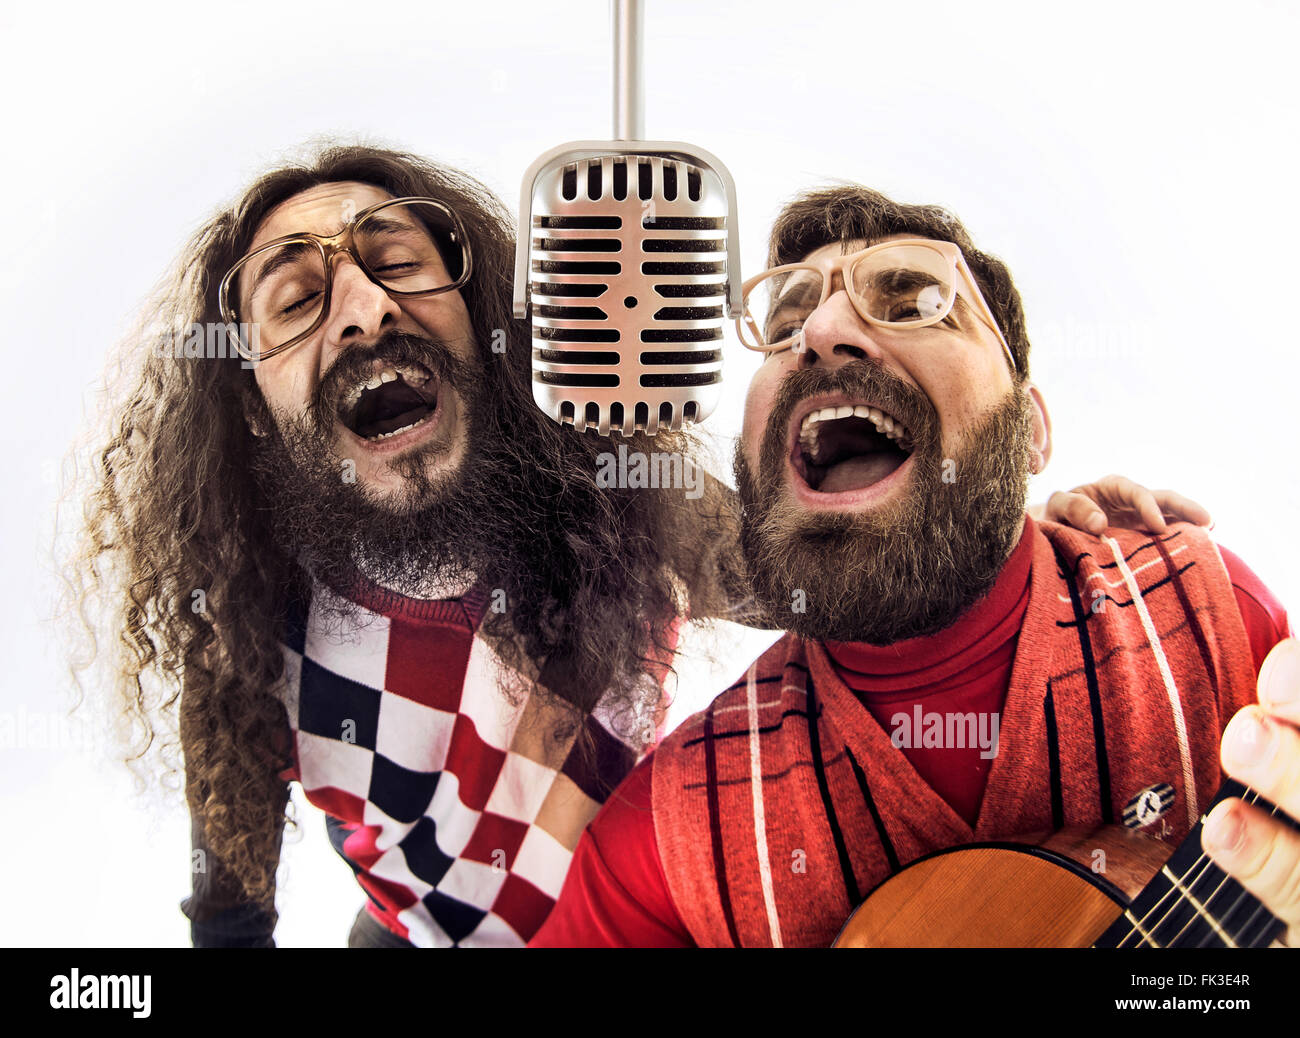 Dos muchachos nerdy cantando juntos Imagen De Stock